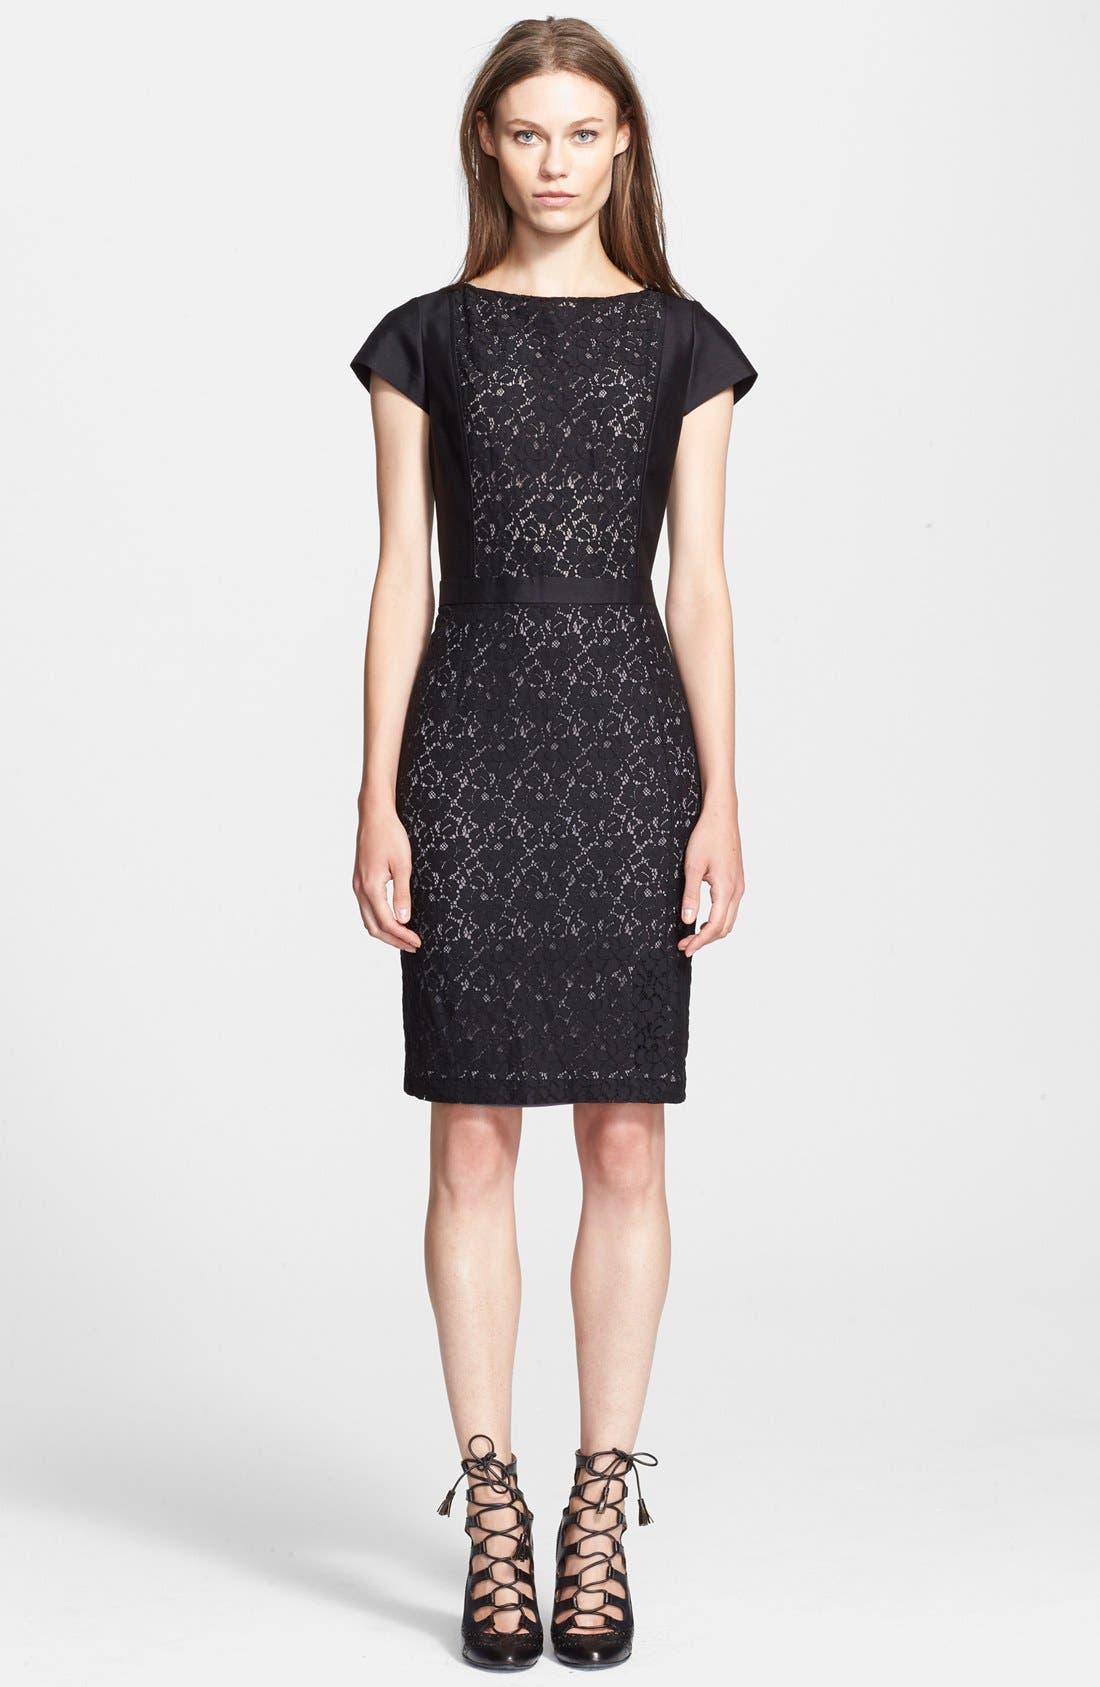 Main Image - Tory Burch 'Mariana' Dress